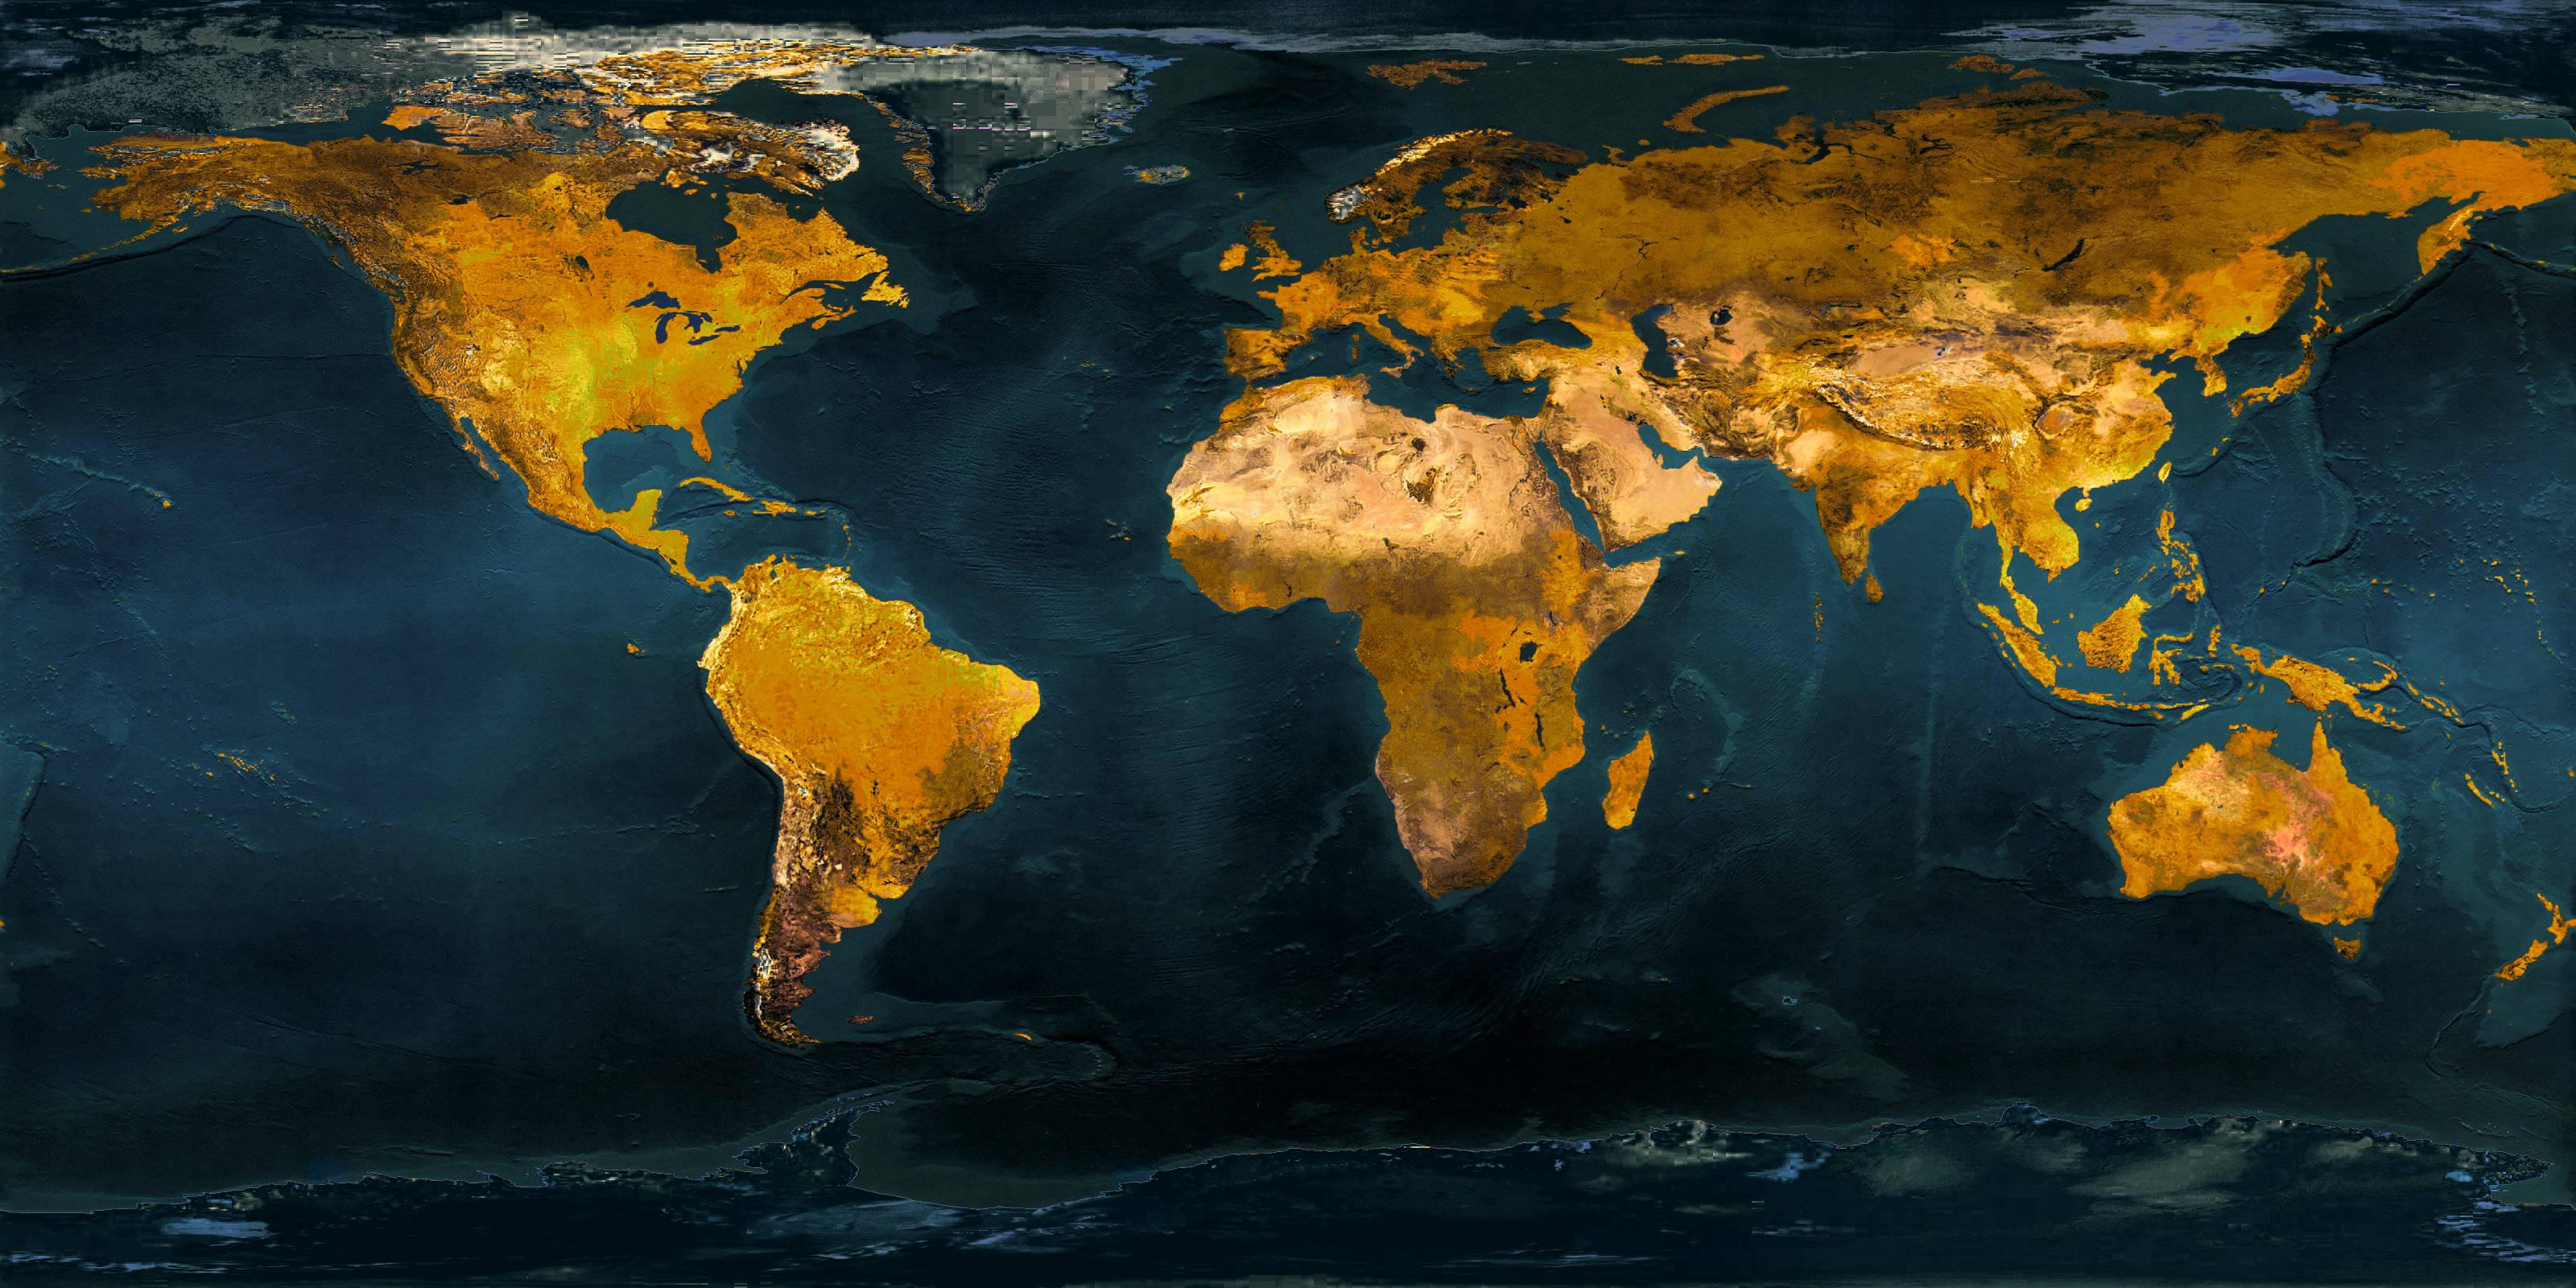 Earth Maps 32001600 Wallpaper 886812 3200x1600